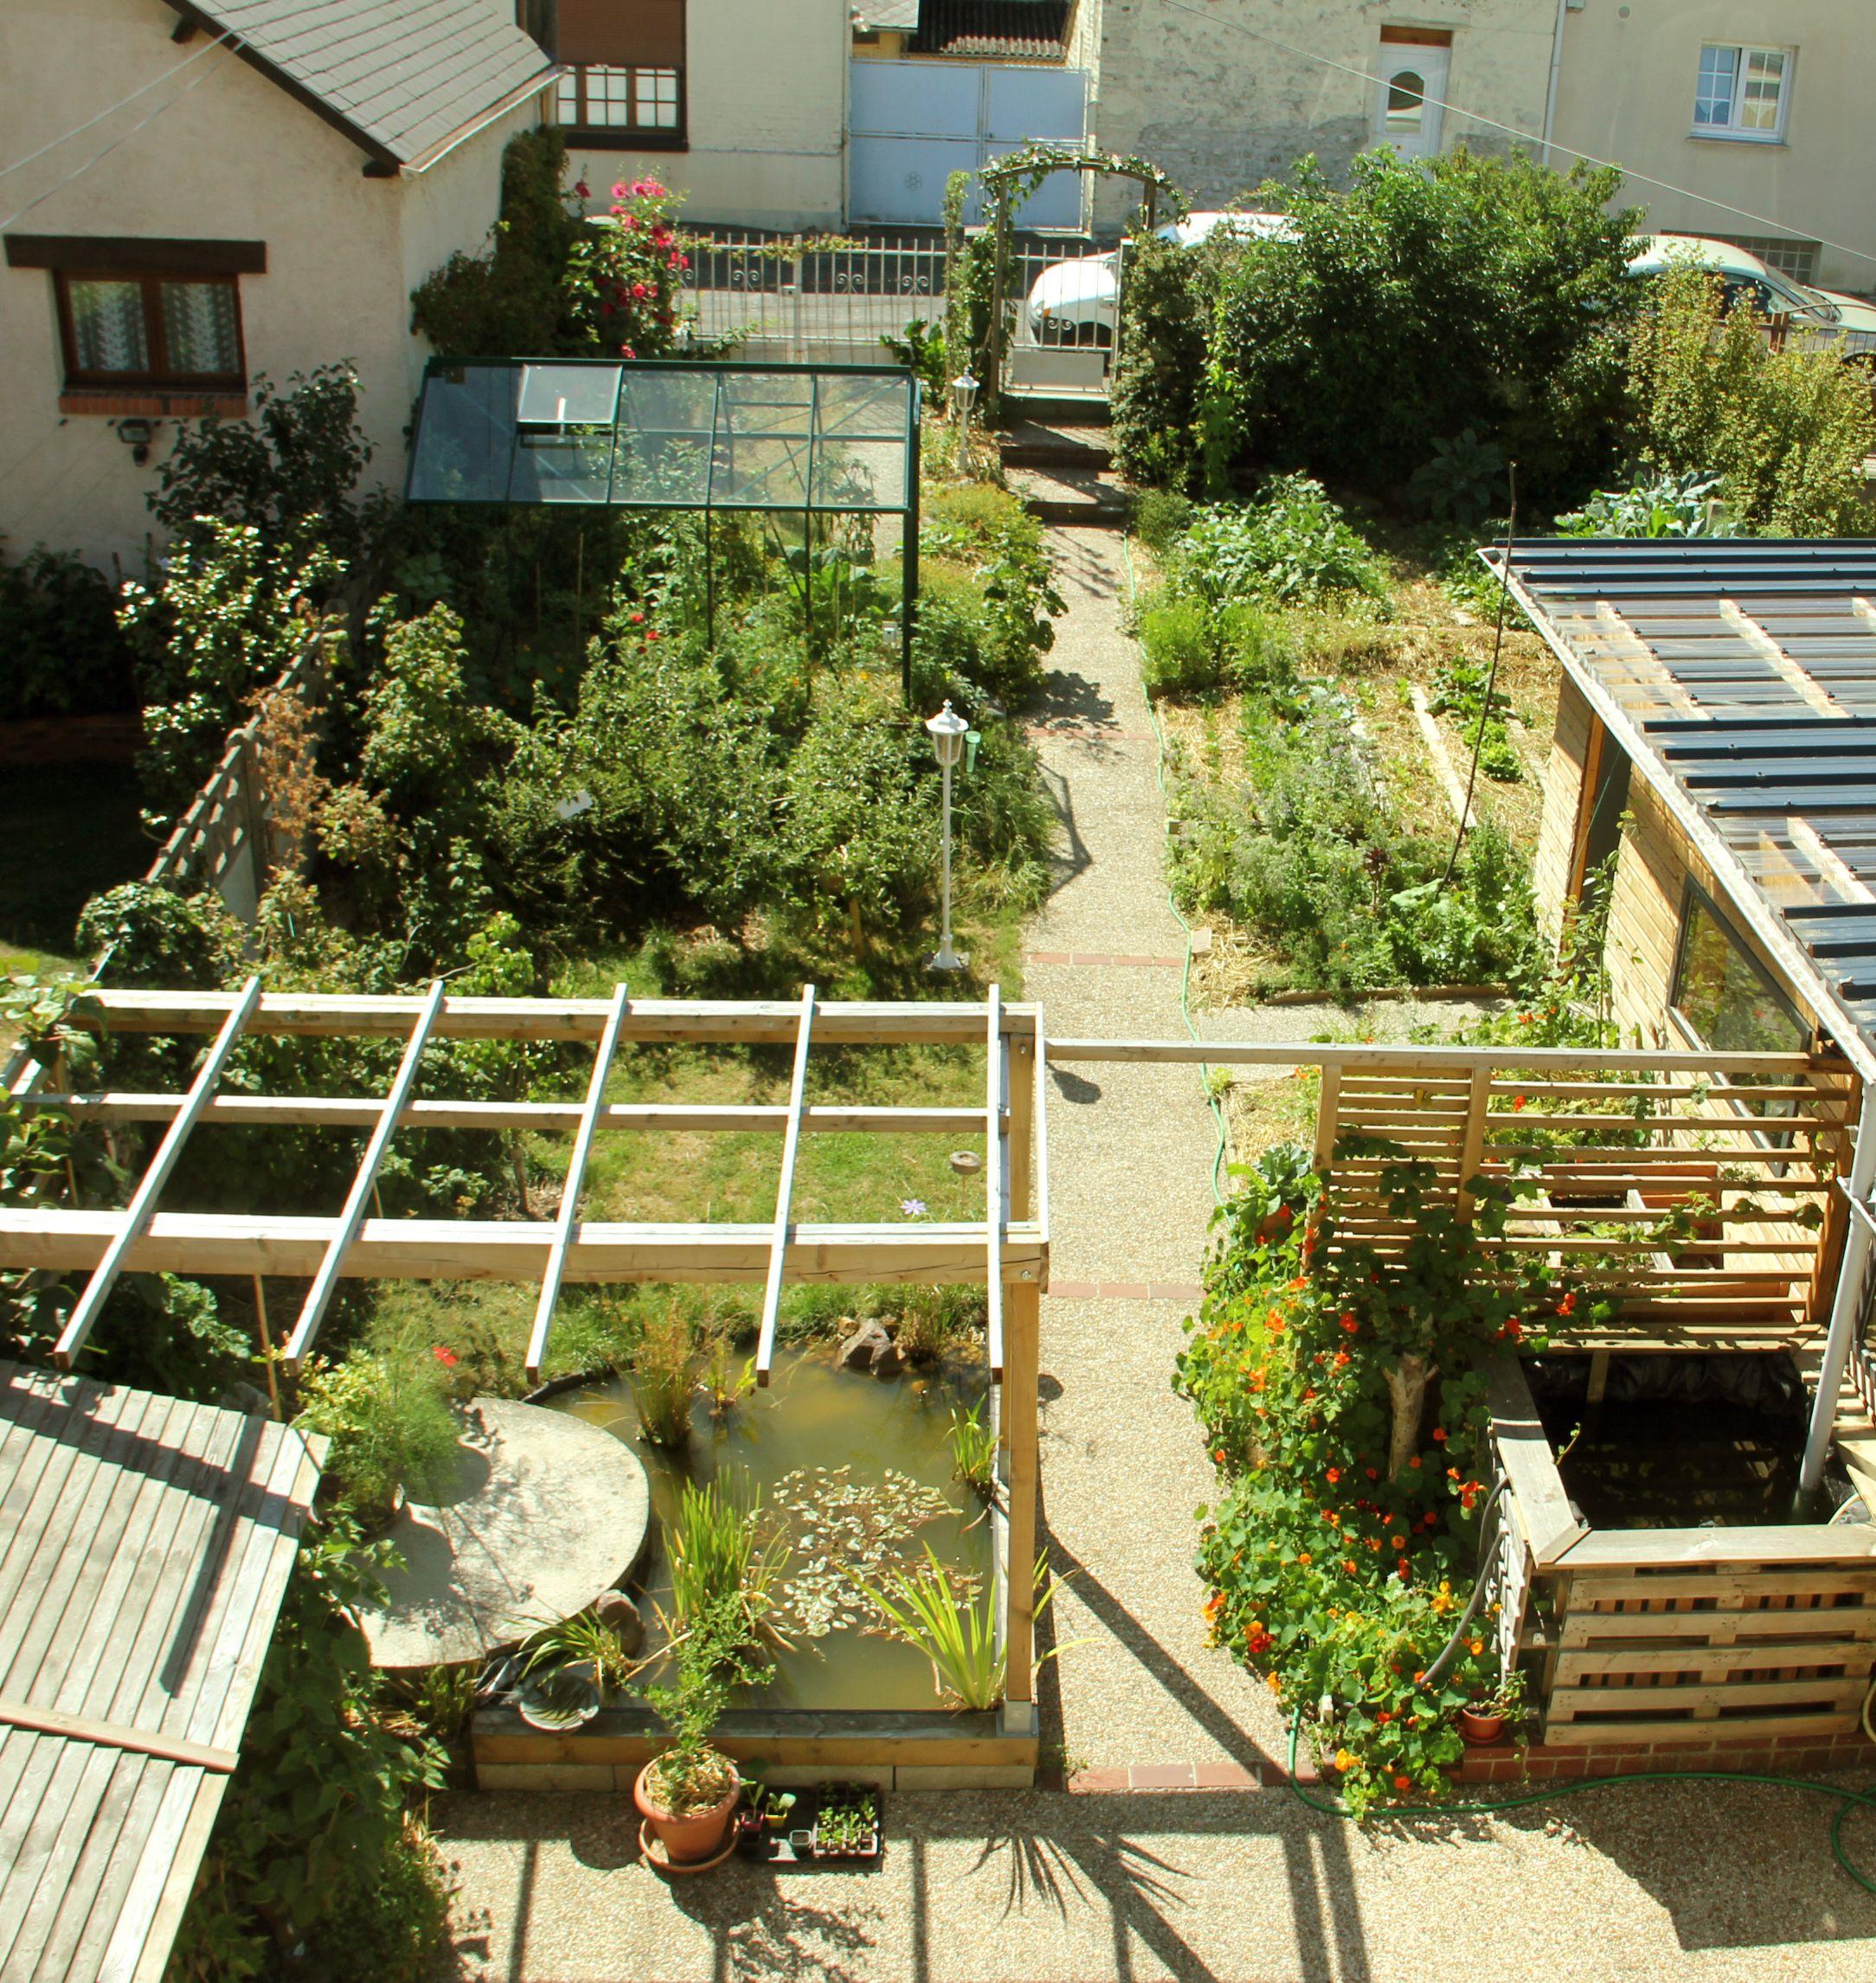 200d05a36fa3120aca2b625ed043c54d Frais De Petit Abri Jardin Concept